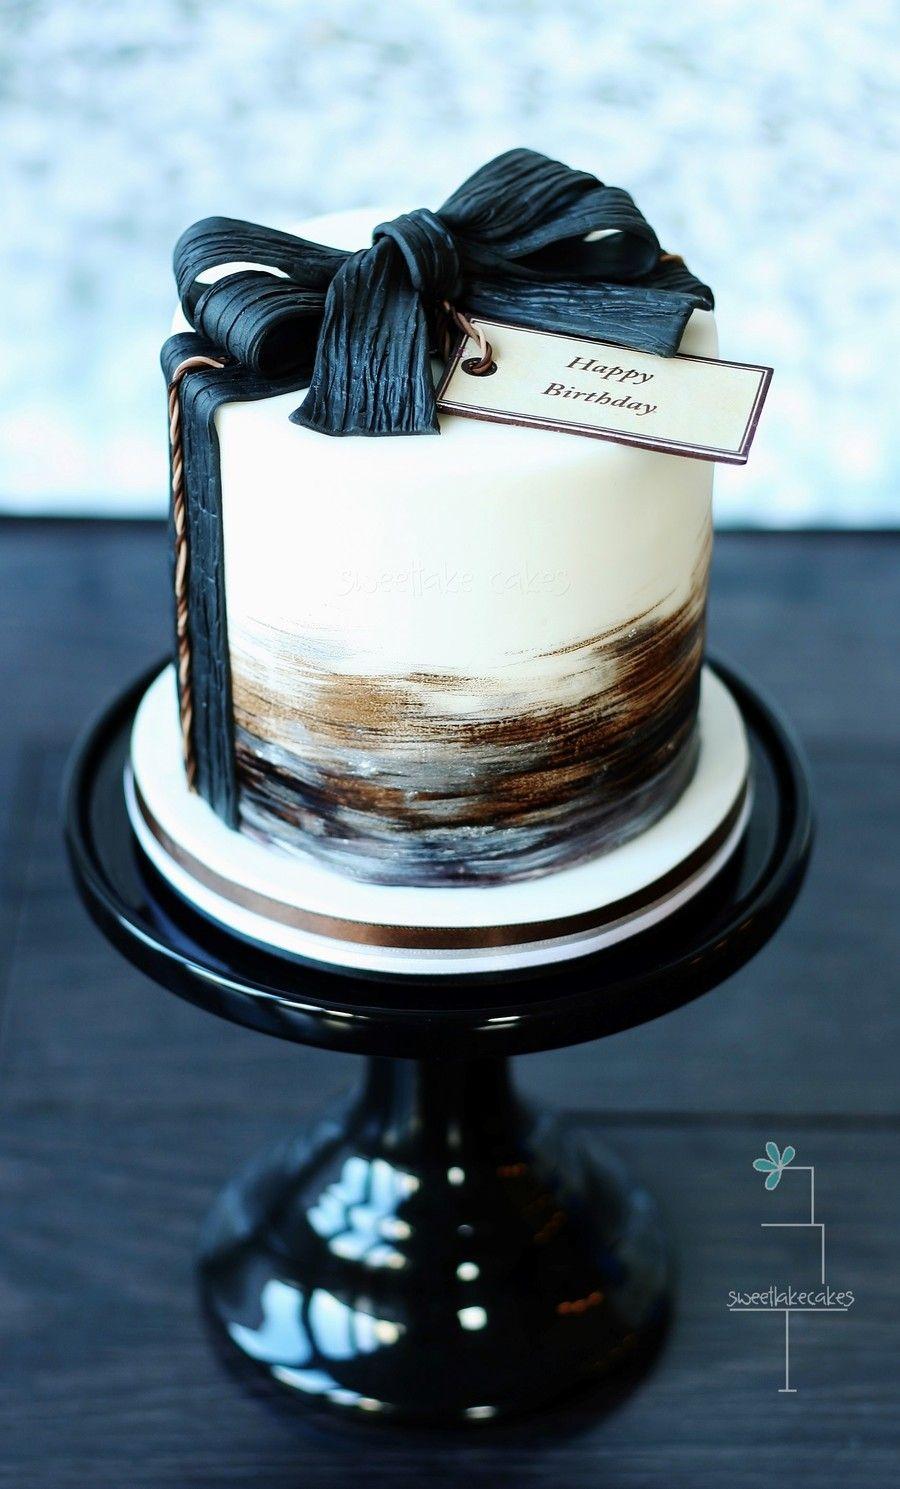 Wondrous A Gentlemans Cake Small Birthday Cakes 40Th Birthday Cakes Funny Birthday Cards Online Eattedamsfinfo